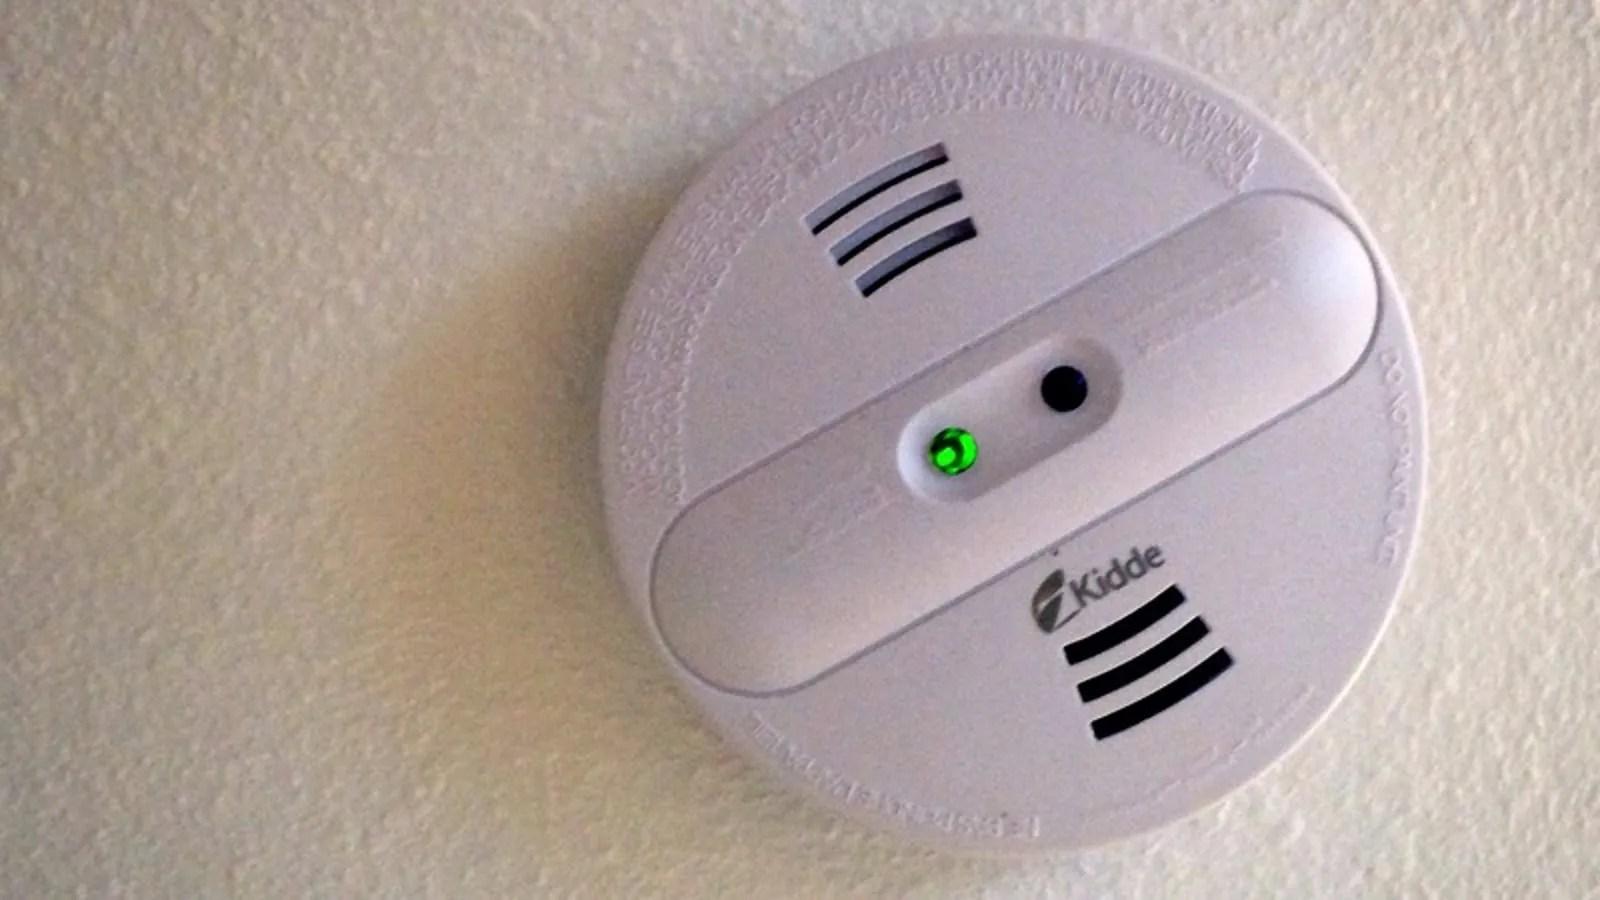 Fullsize Of How To Turn Off Smoke Alarm